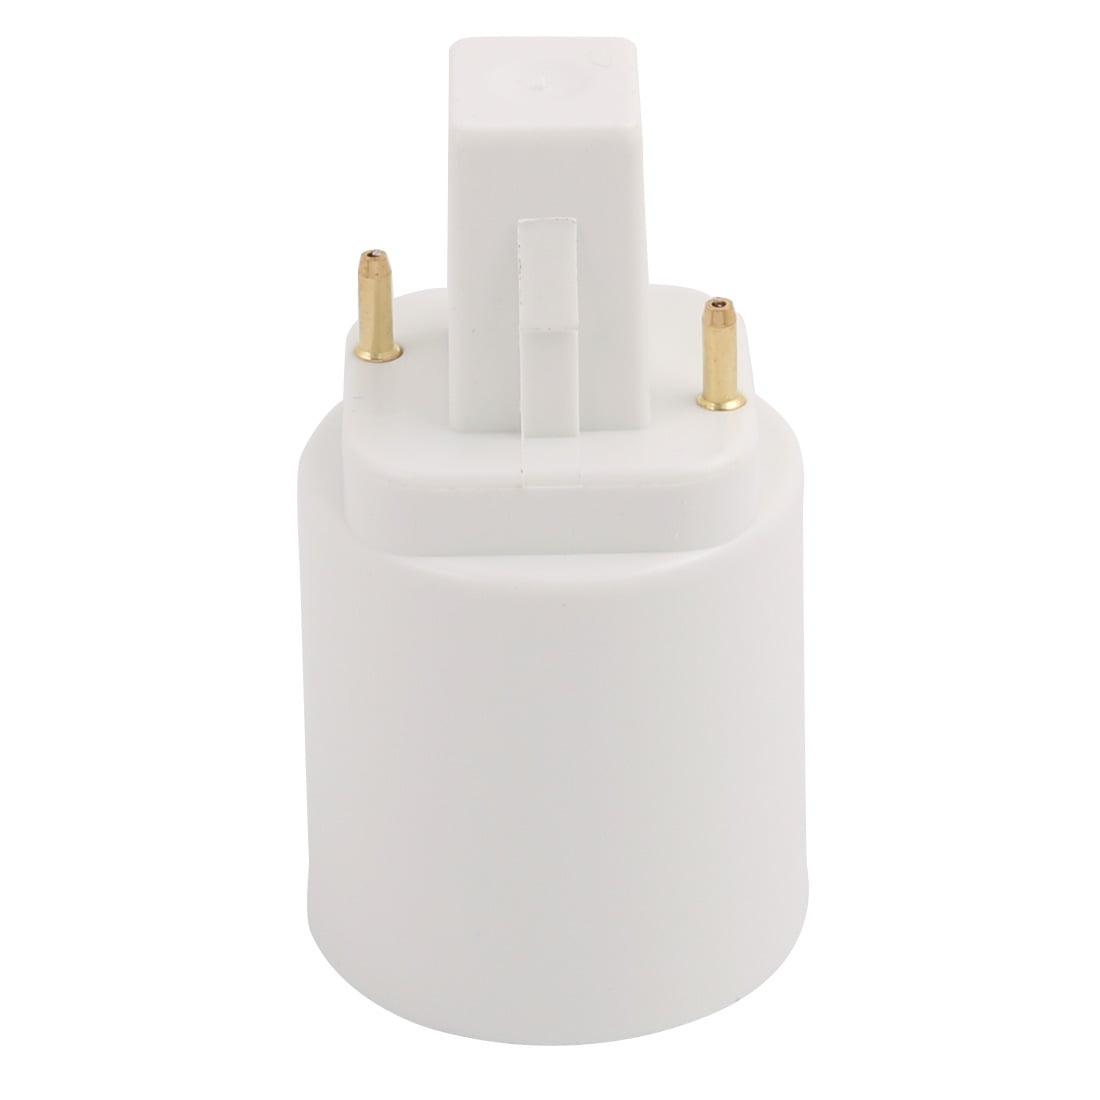 Unique BargainsG24 to E27 Light Socket, Bulb Base Adapter Converter, Commutator 10Pcs - image 2 of 4